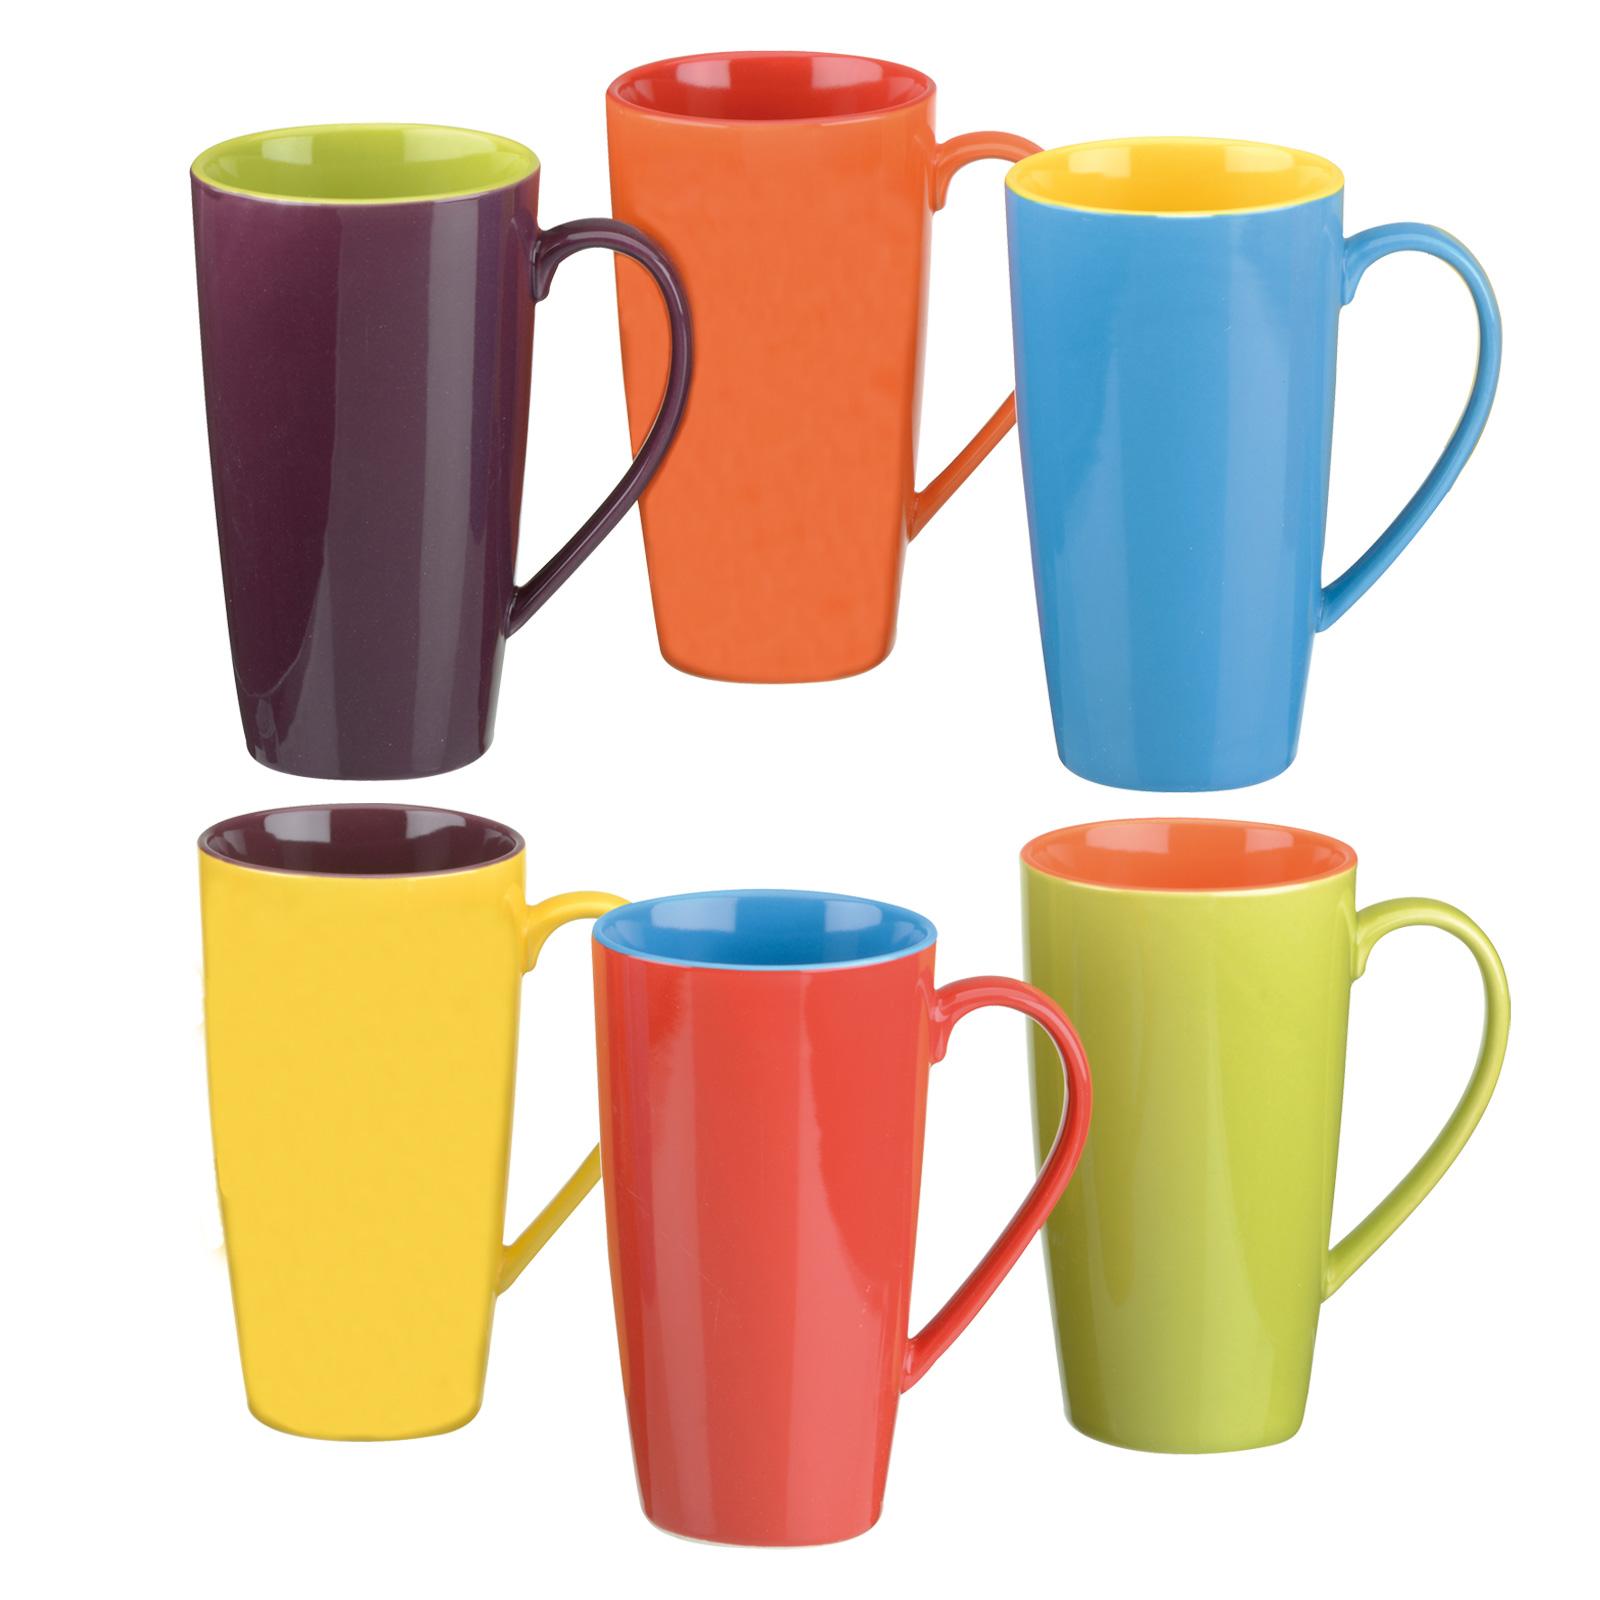 Set of 6 Harlequin Latte Mugs